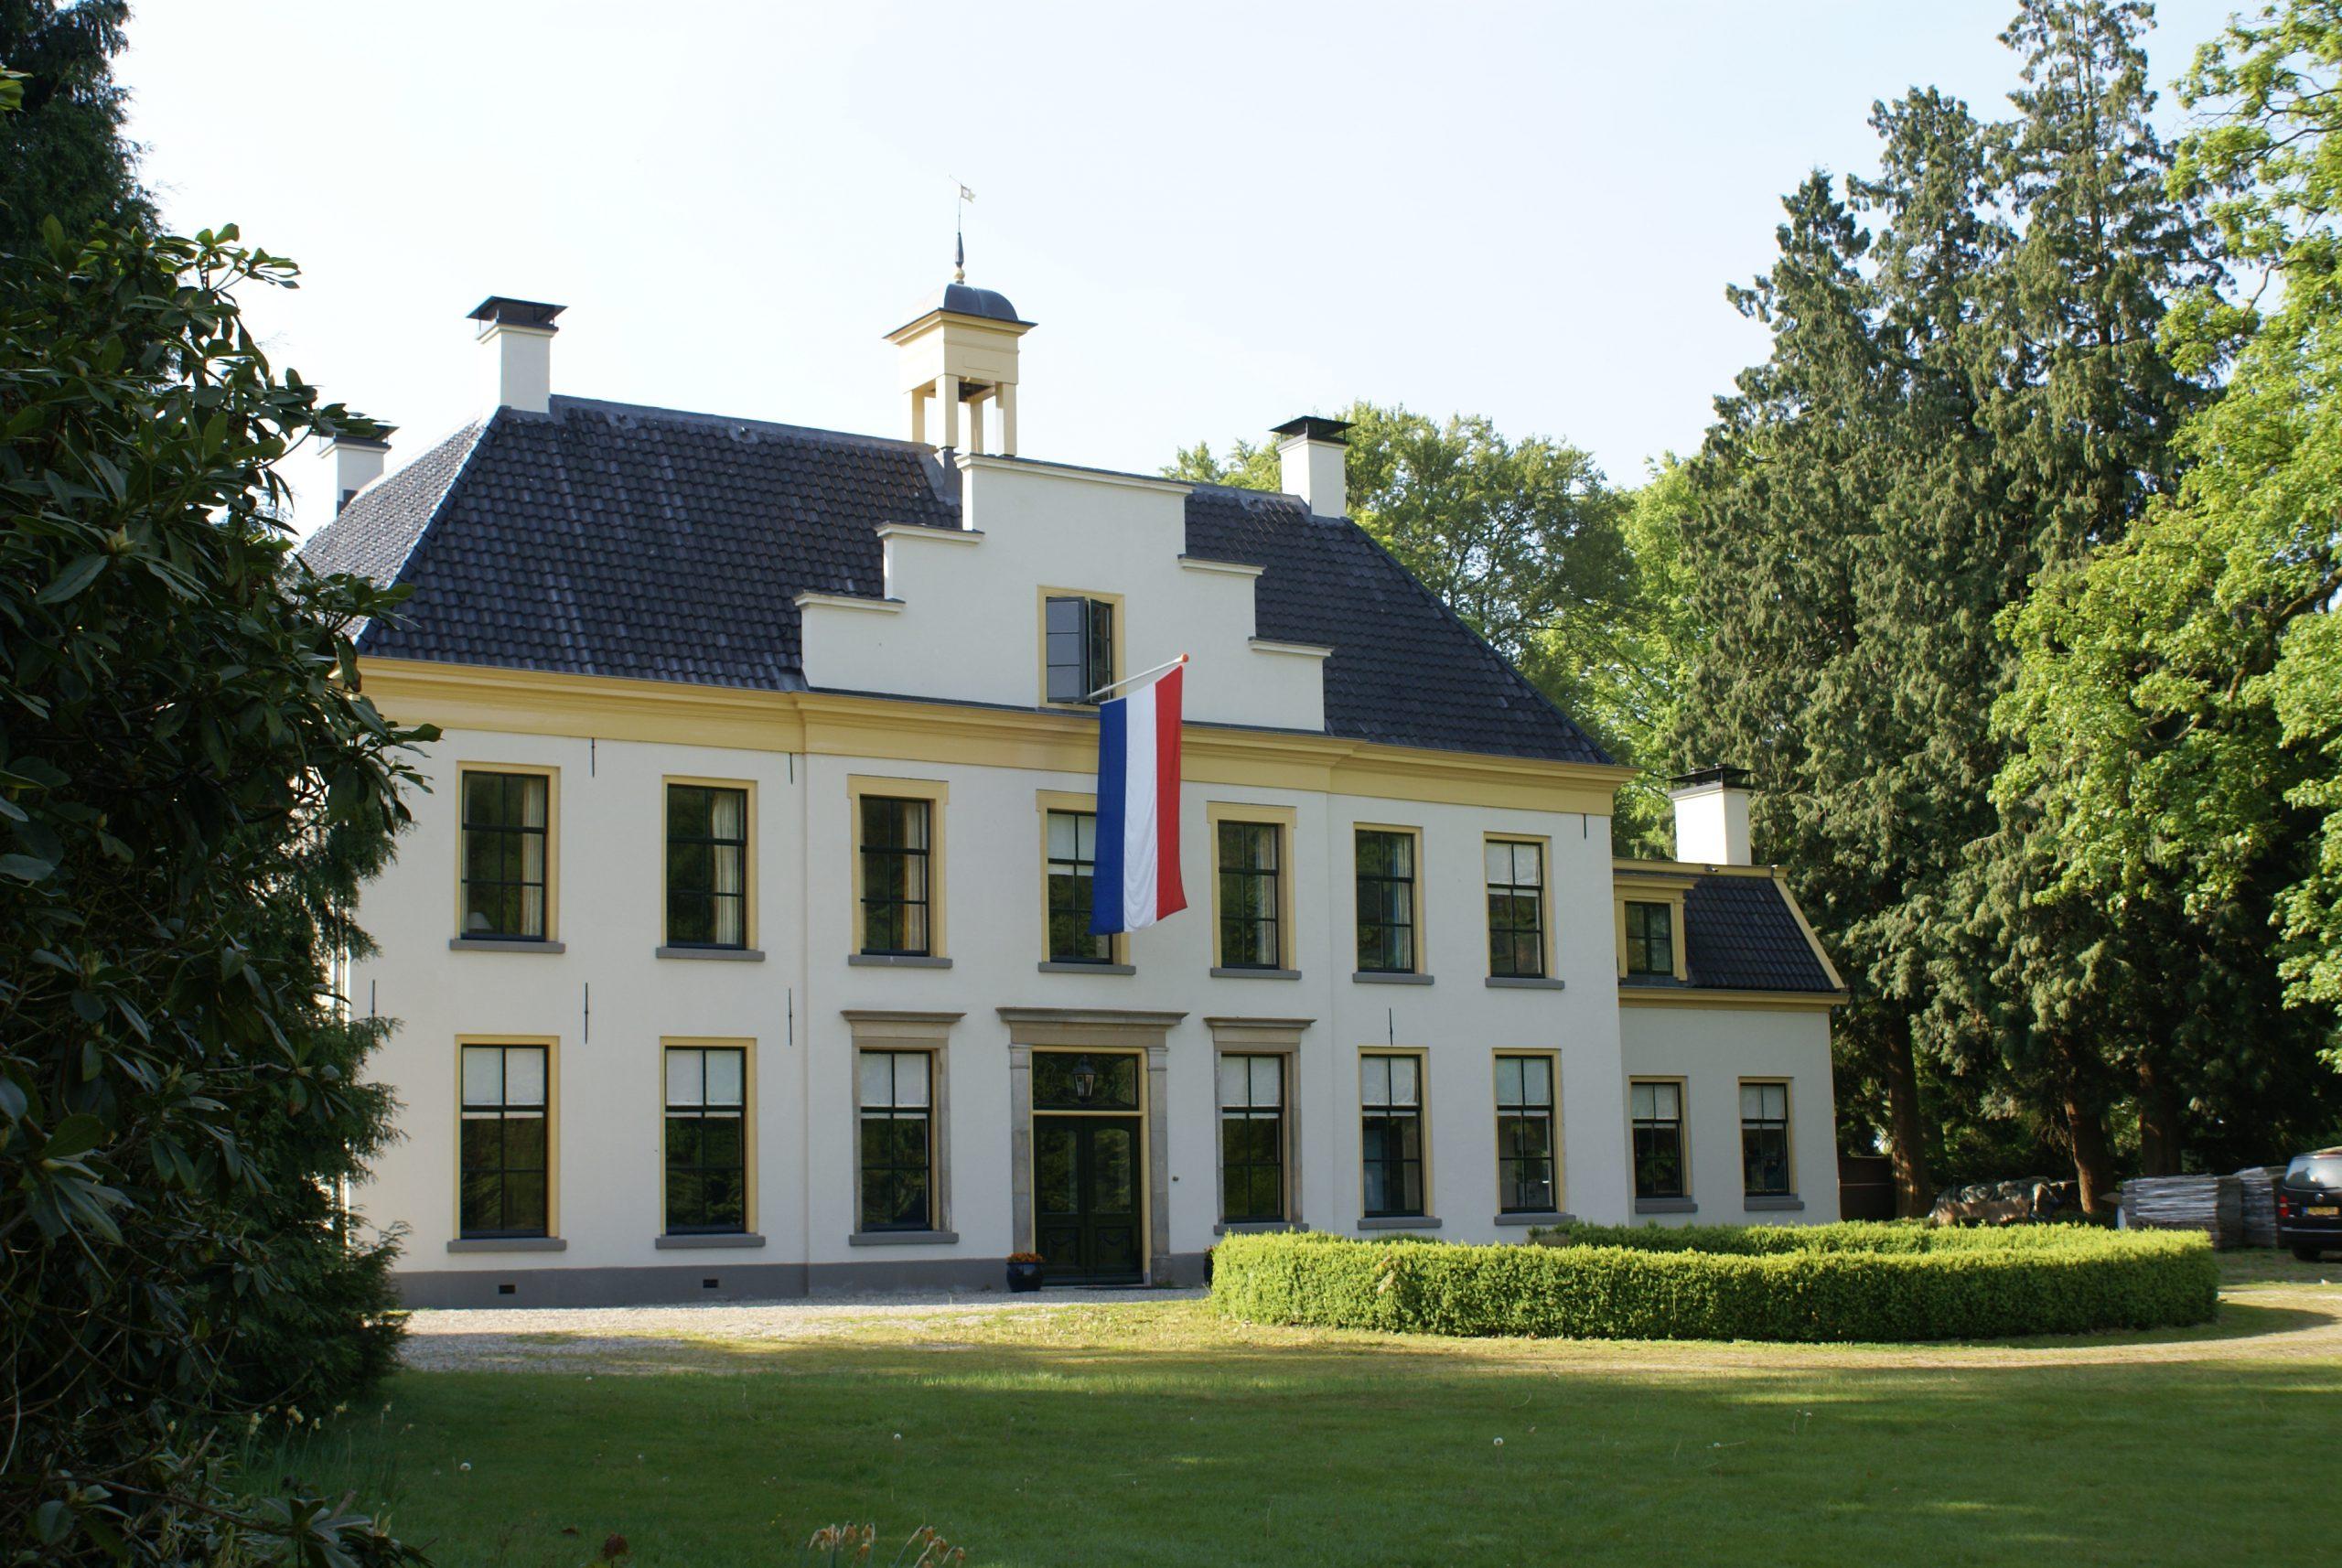 Landgoed Huis Schouwenburg